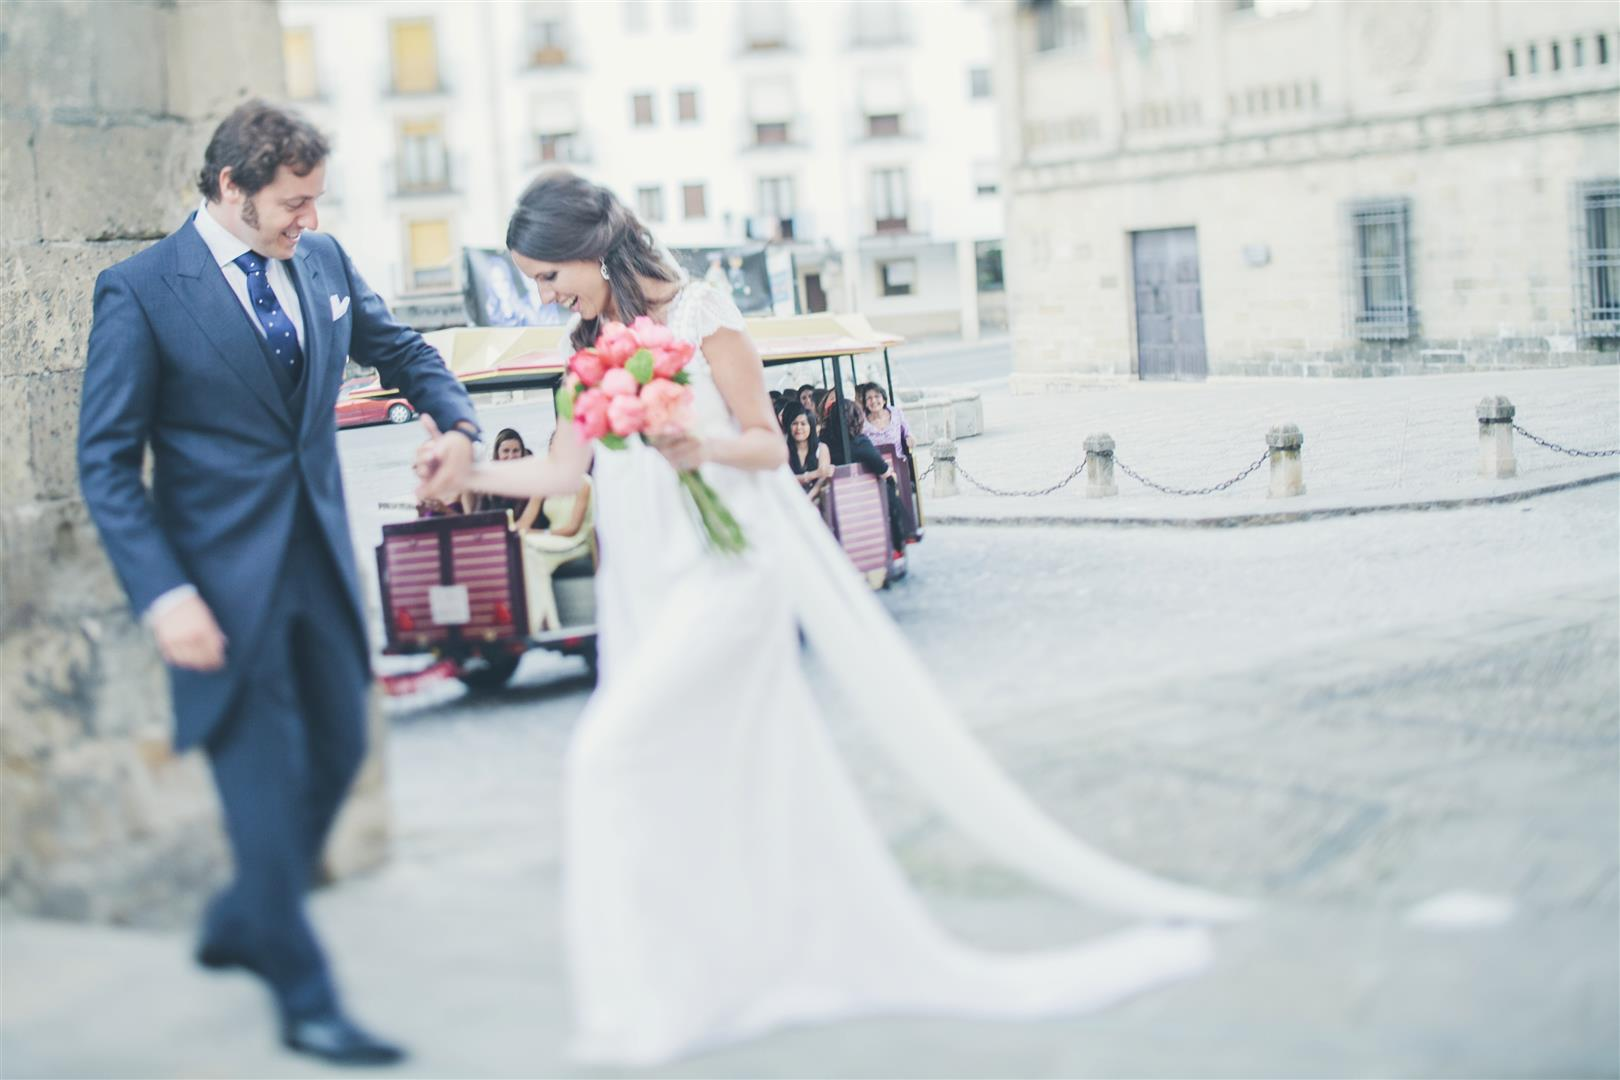 alquilar tren turistico boda invitados